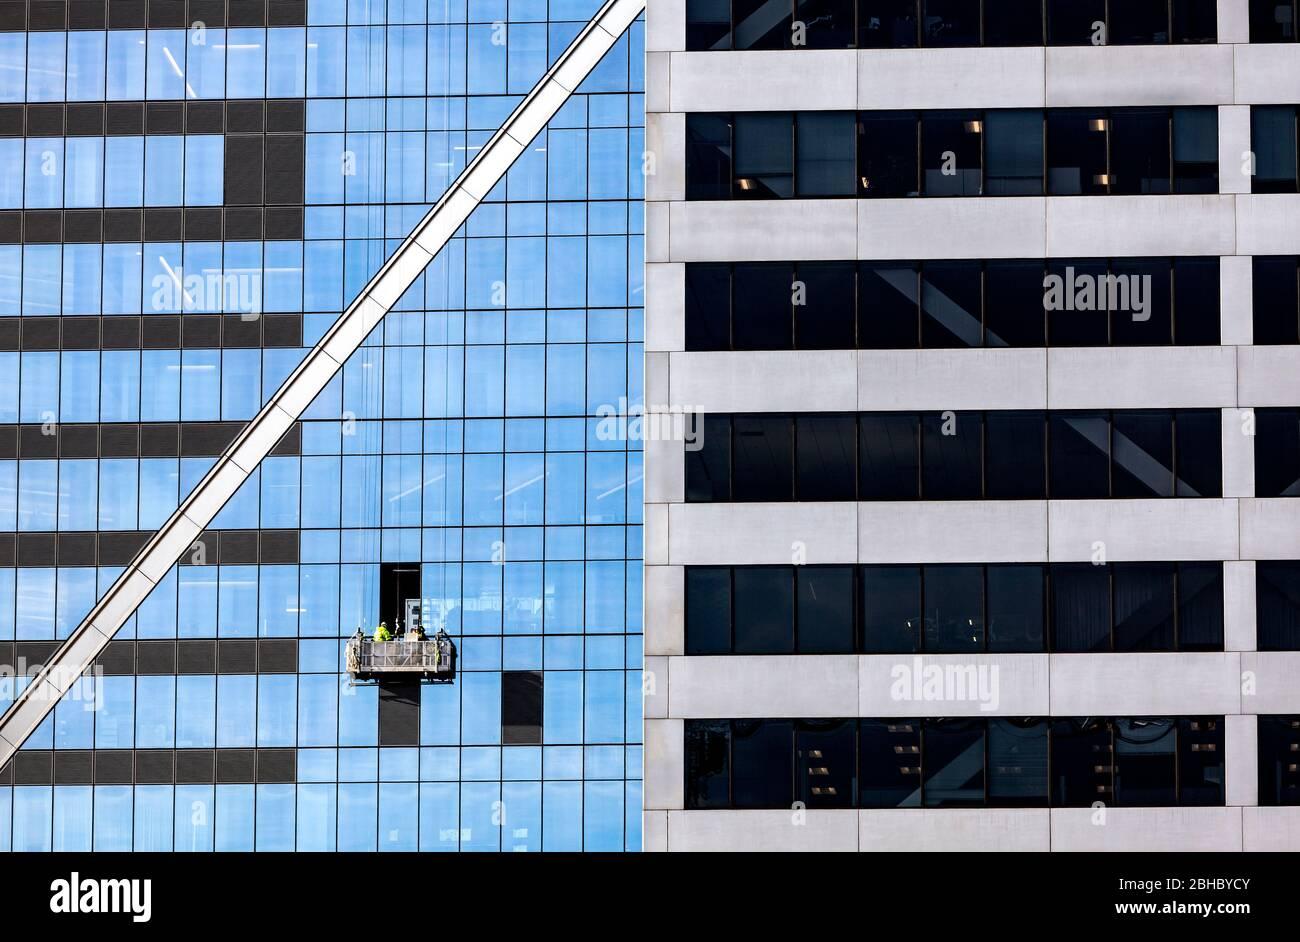 WA17439-00...WASHINGTON - edificios altos y reflectantes en Seattle. Foto de stock